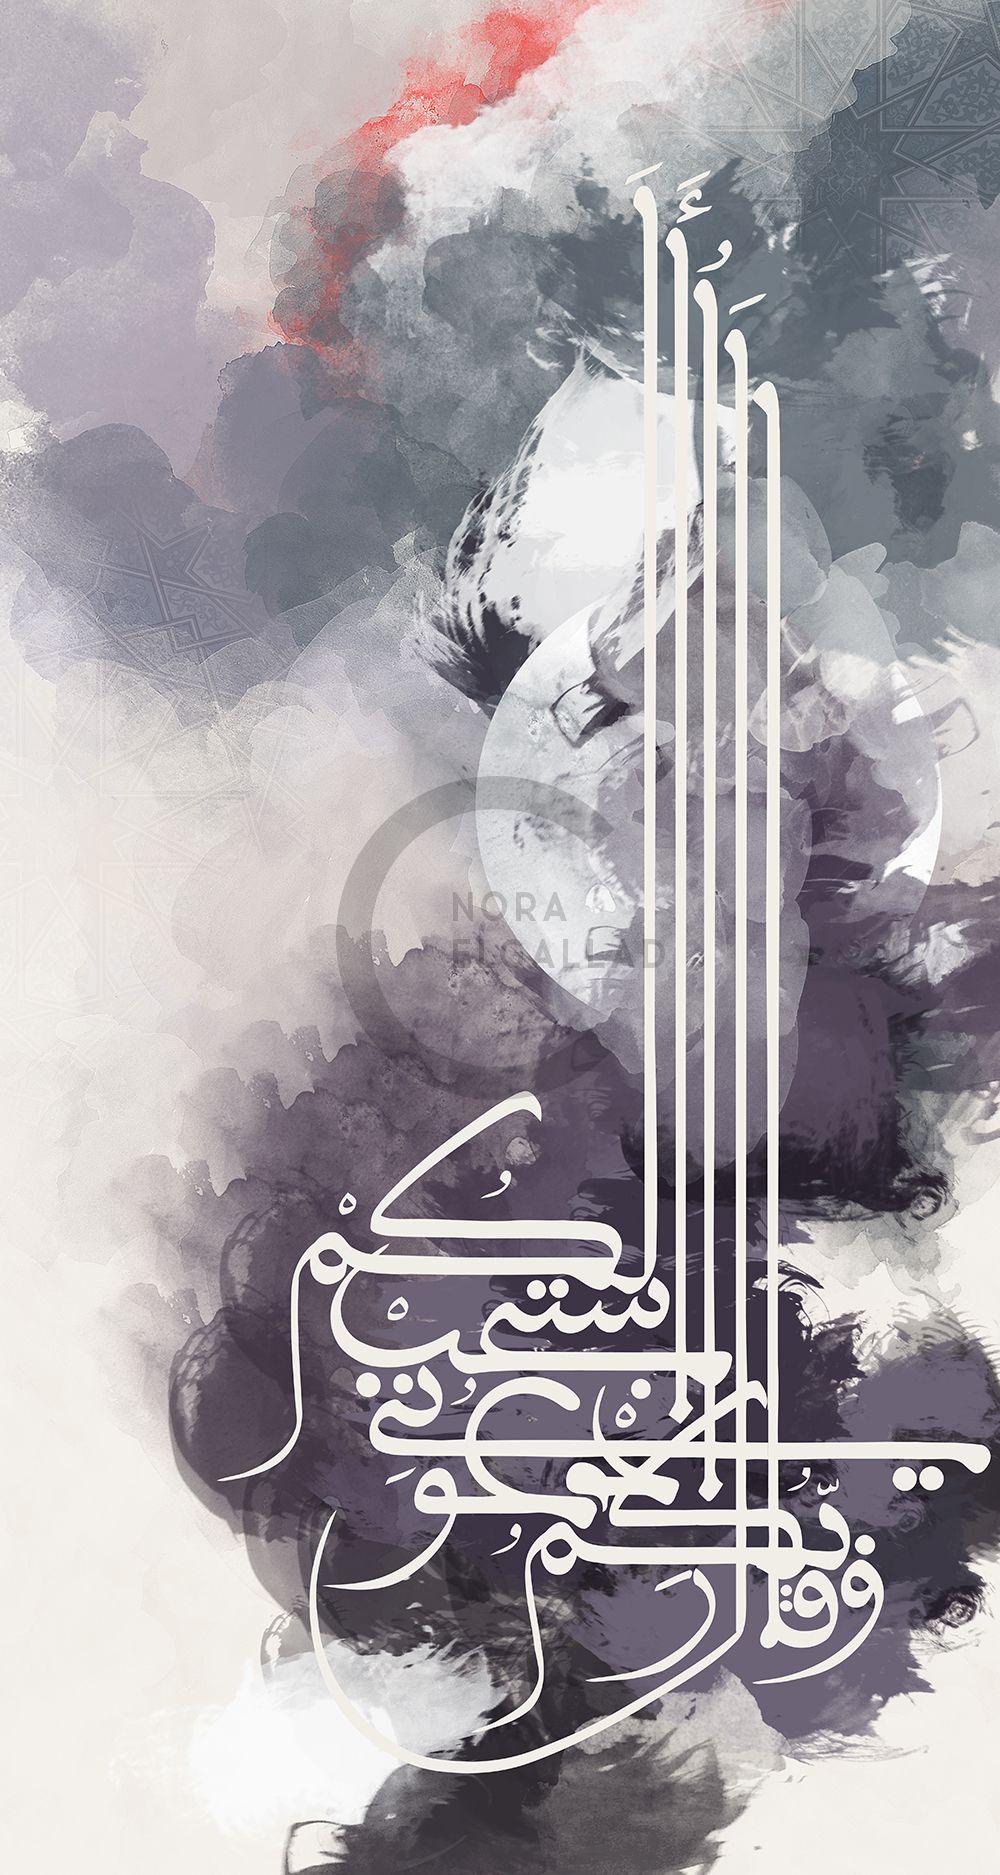 Pray To Allah Copy By Noraalgalad On Deviantart Islamic Caligraphy Art Islamic Art Calligraphy Islamic Calligraphy Painting